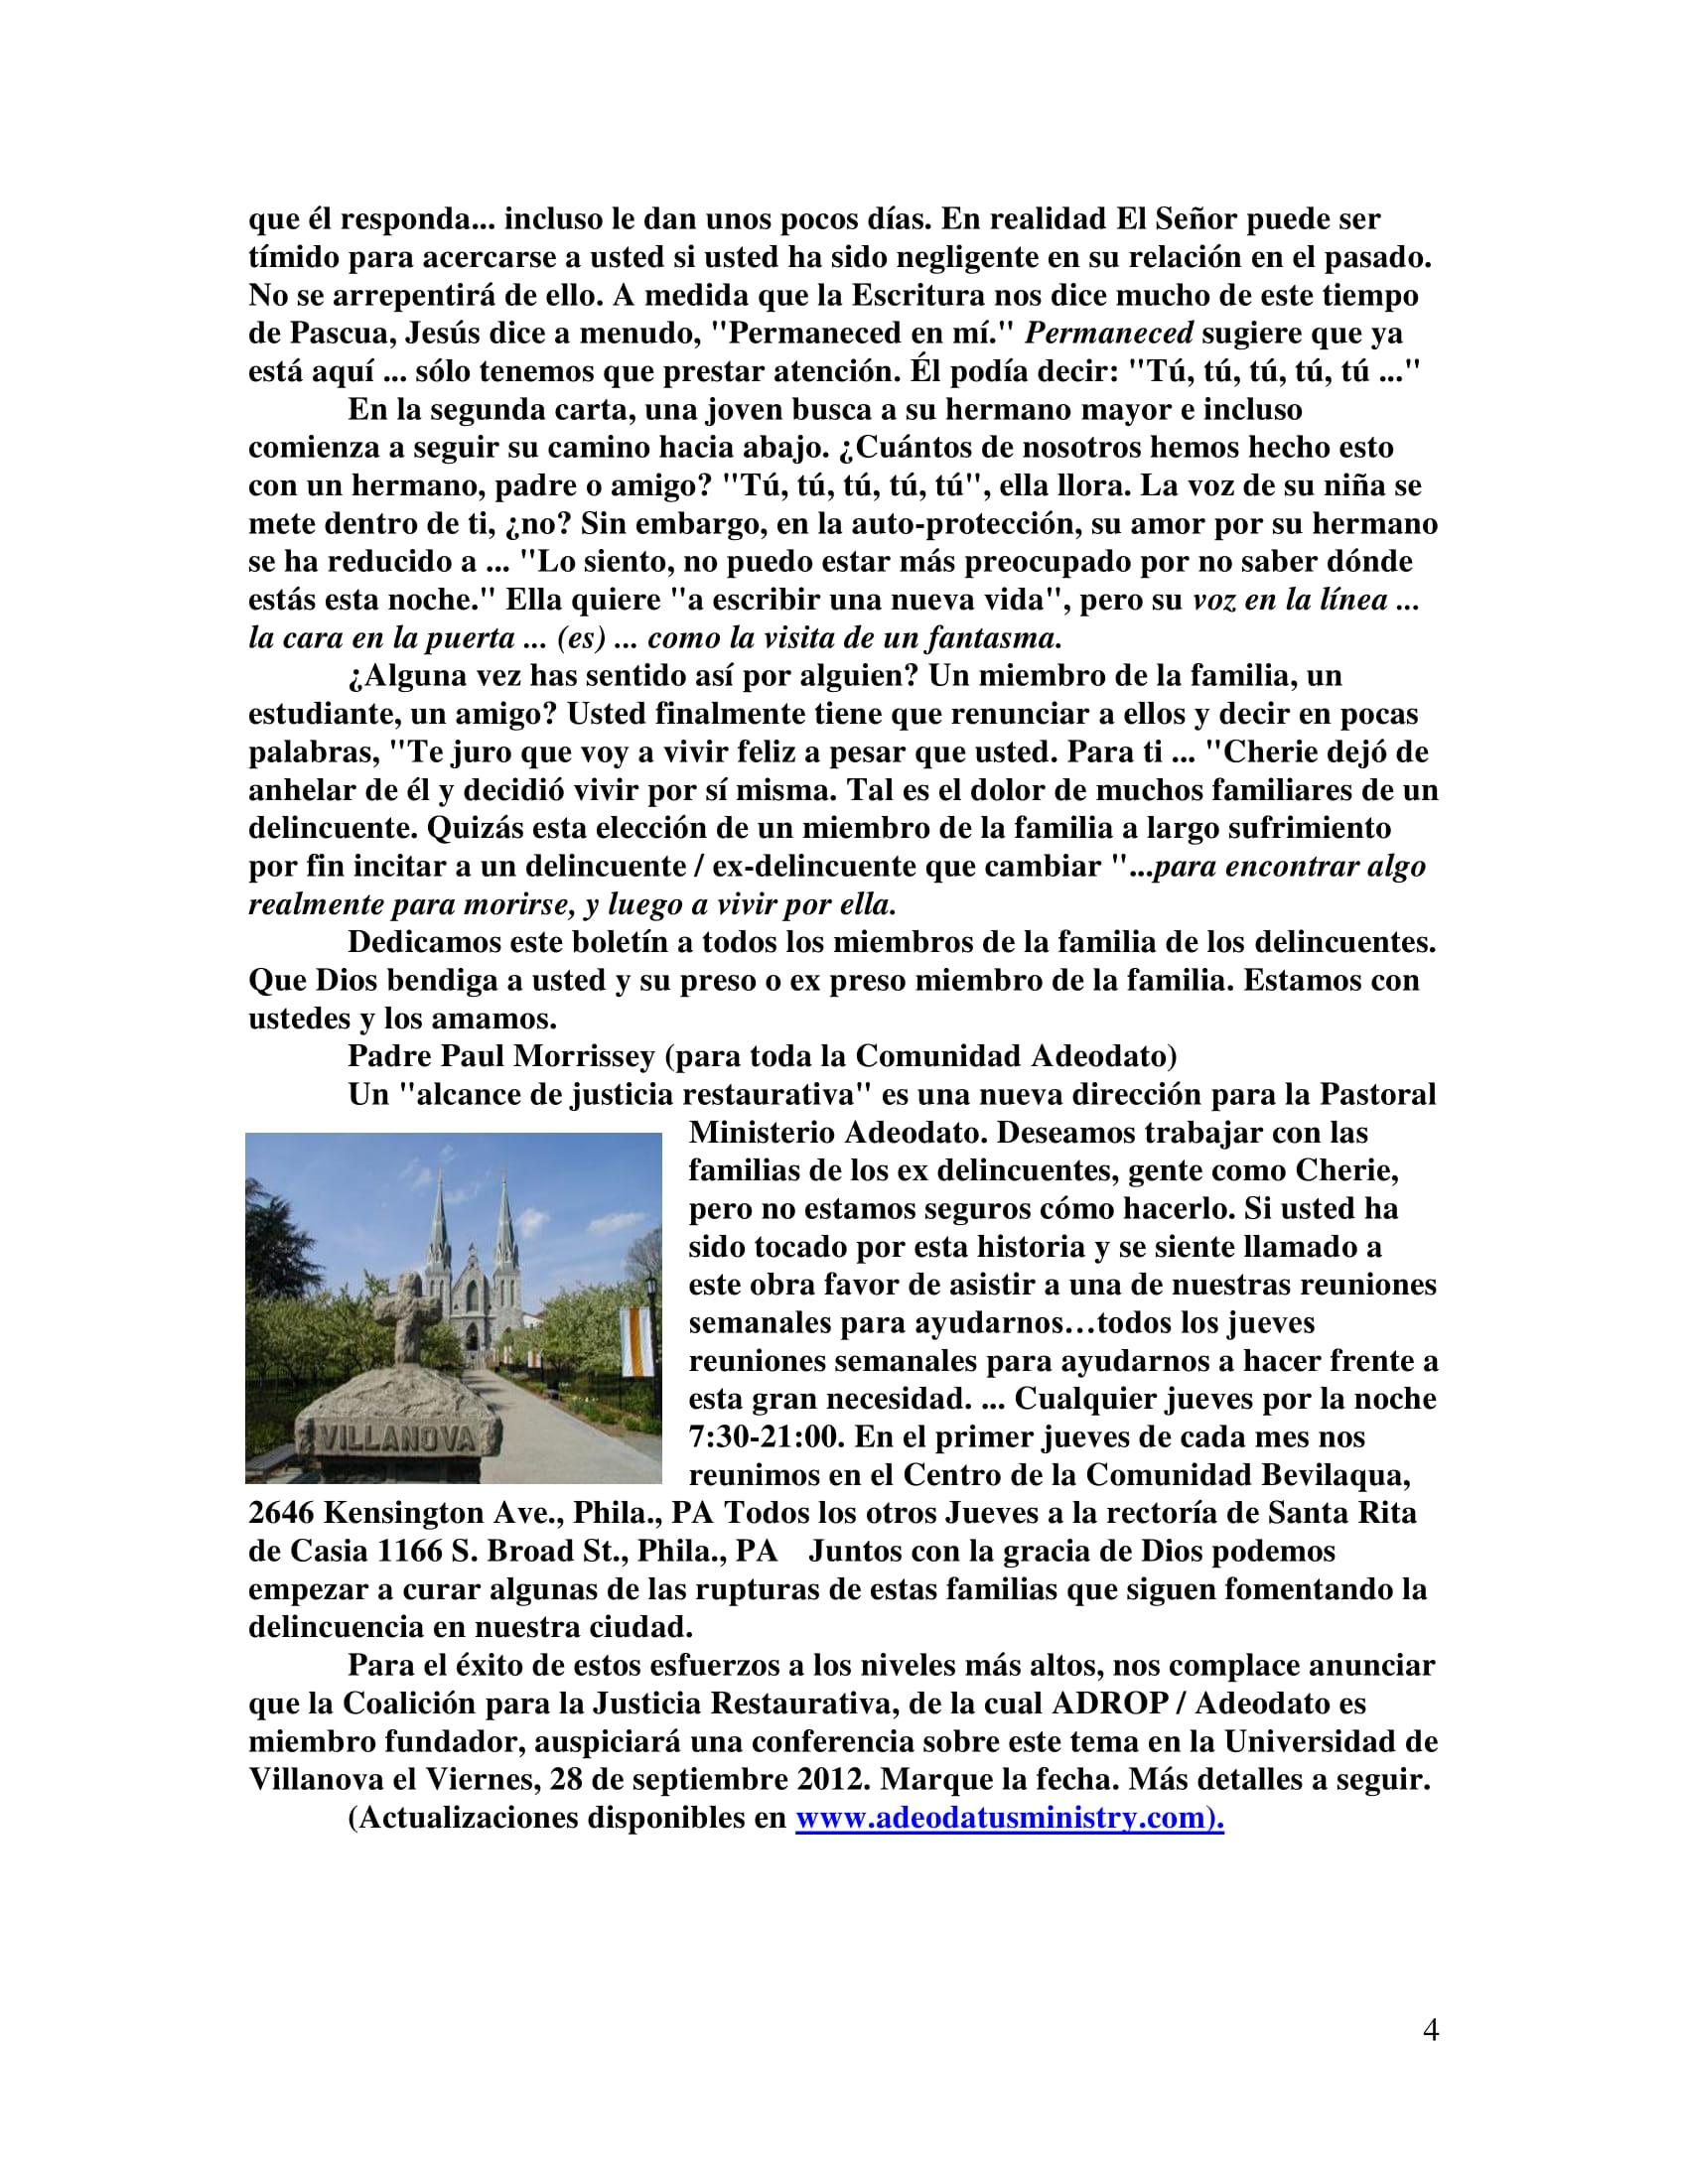 Voices From Prison 12 Spanish-4.jpg